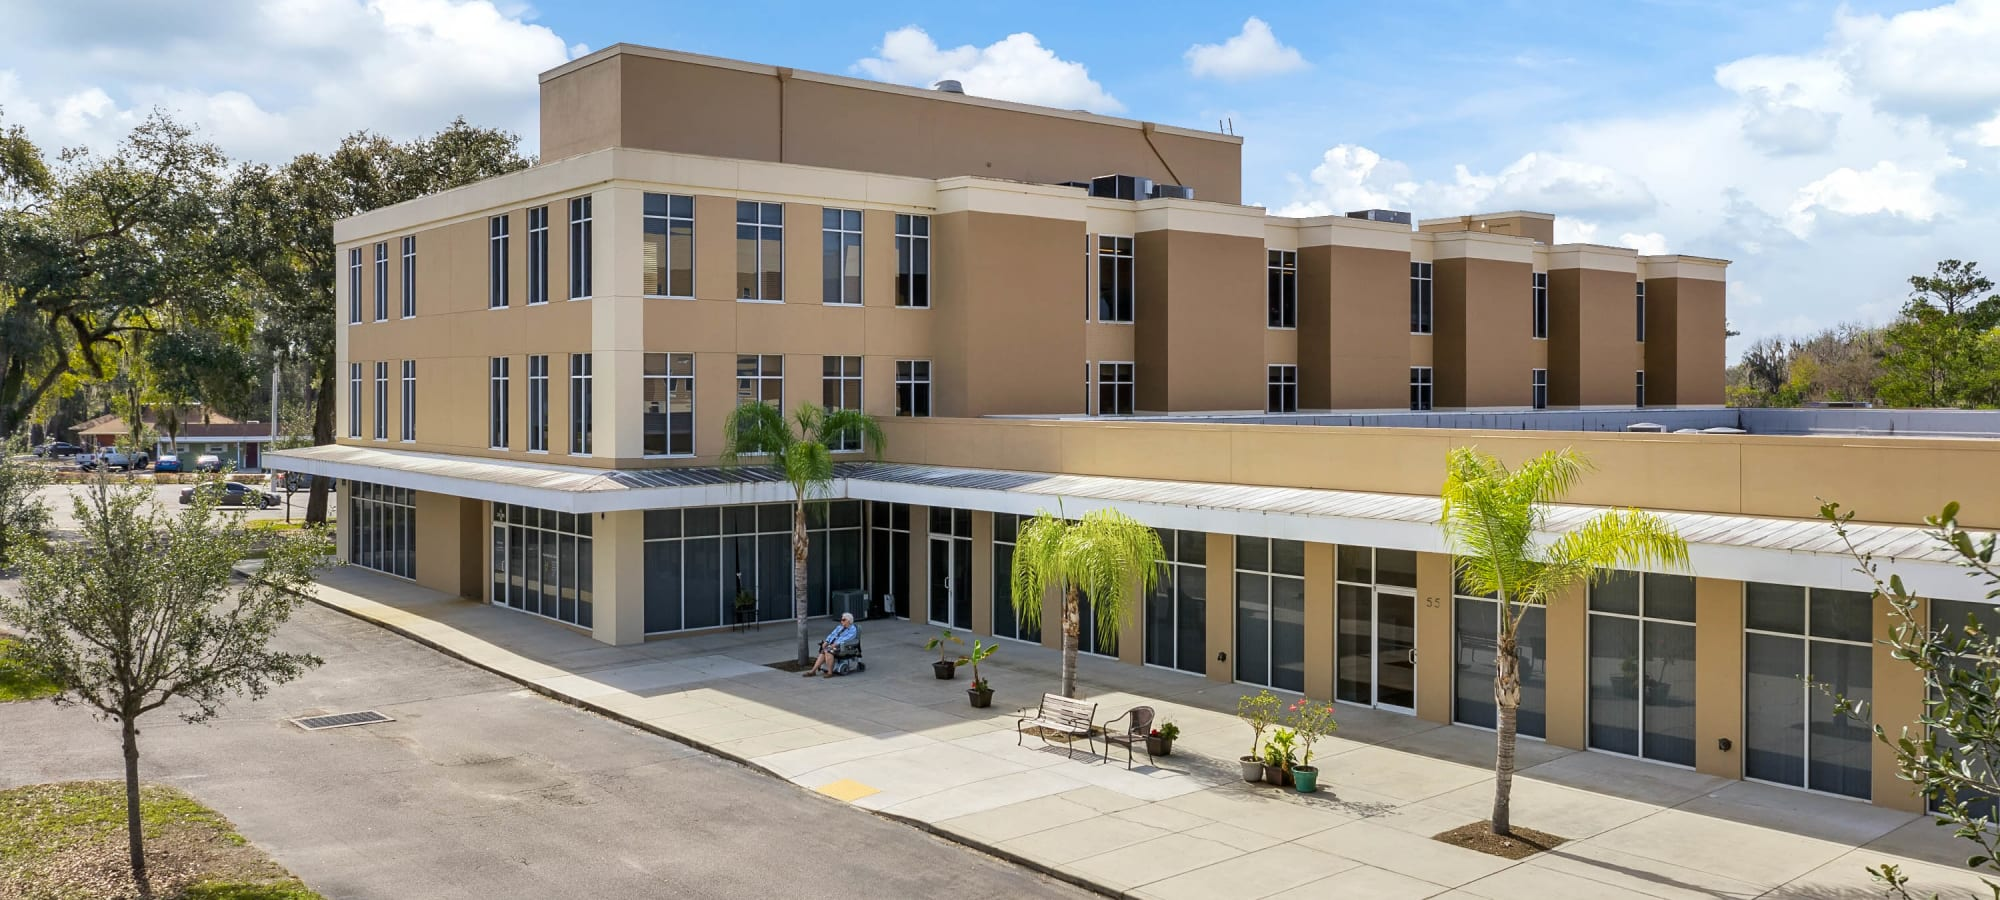 Exterior building image of The Grande in Brooksville, Florida